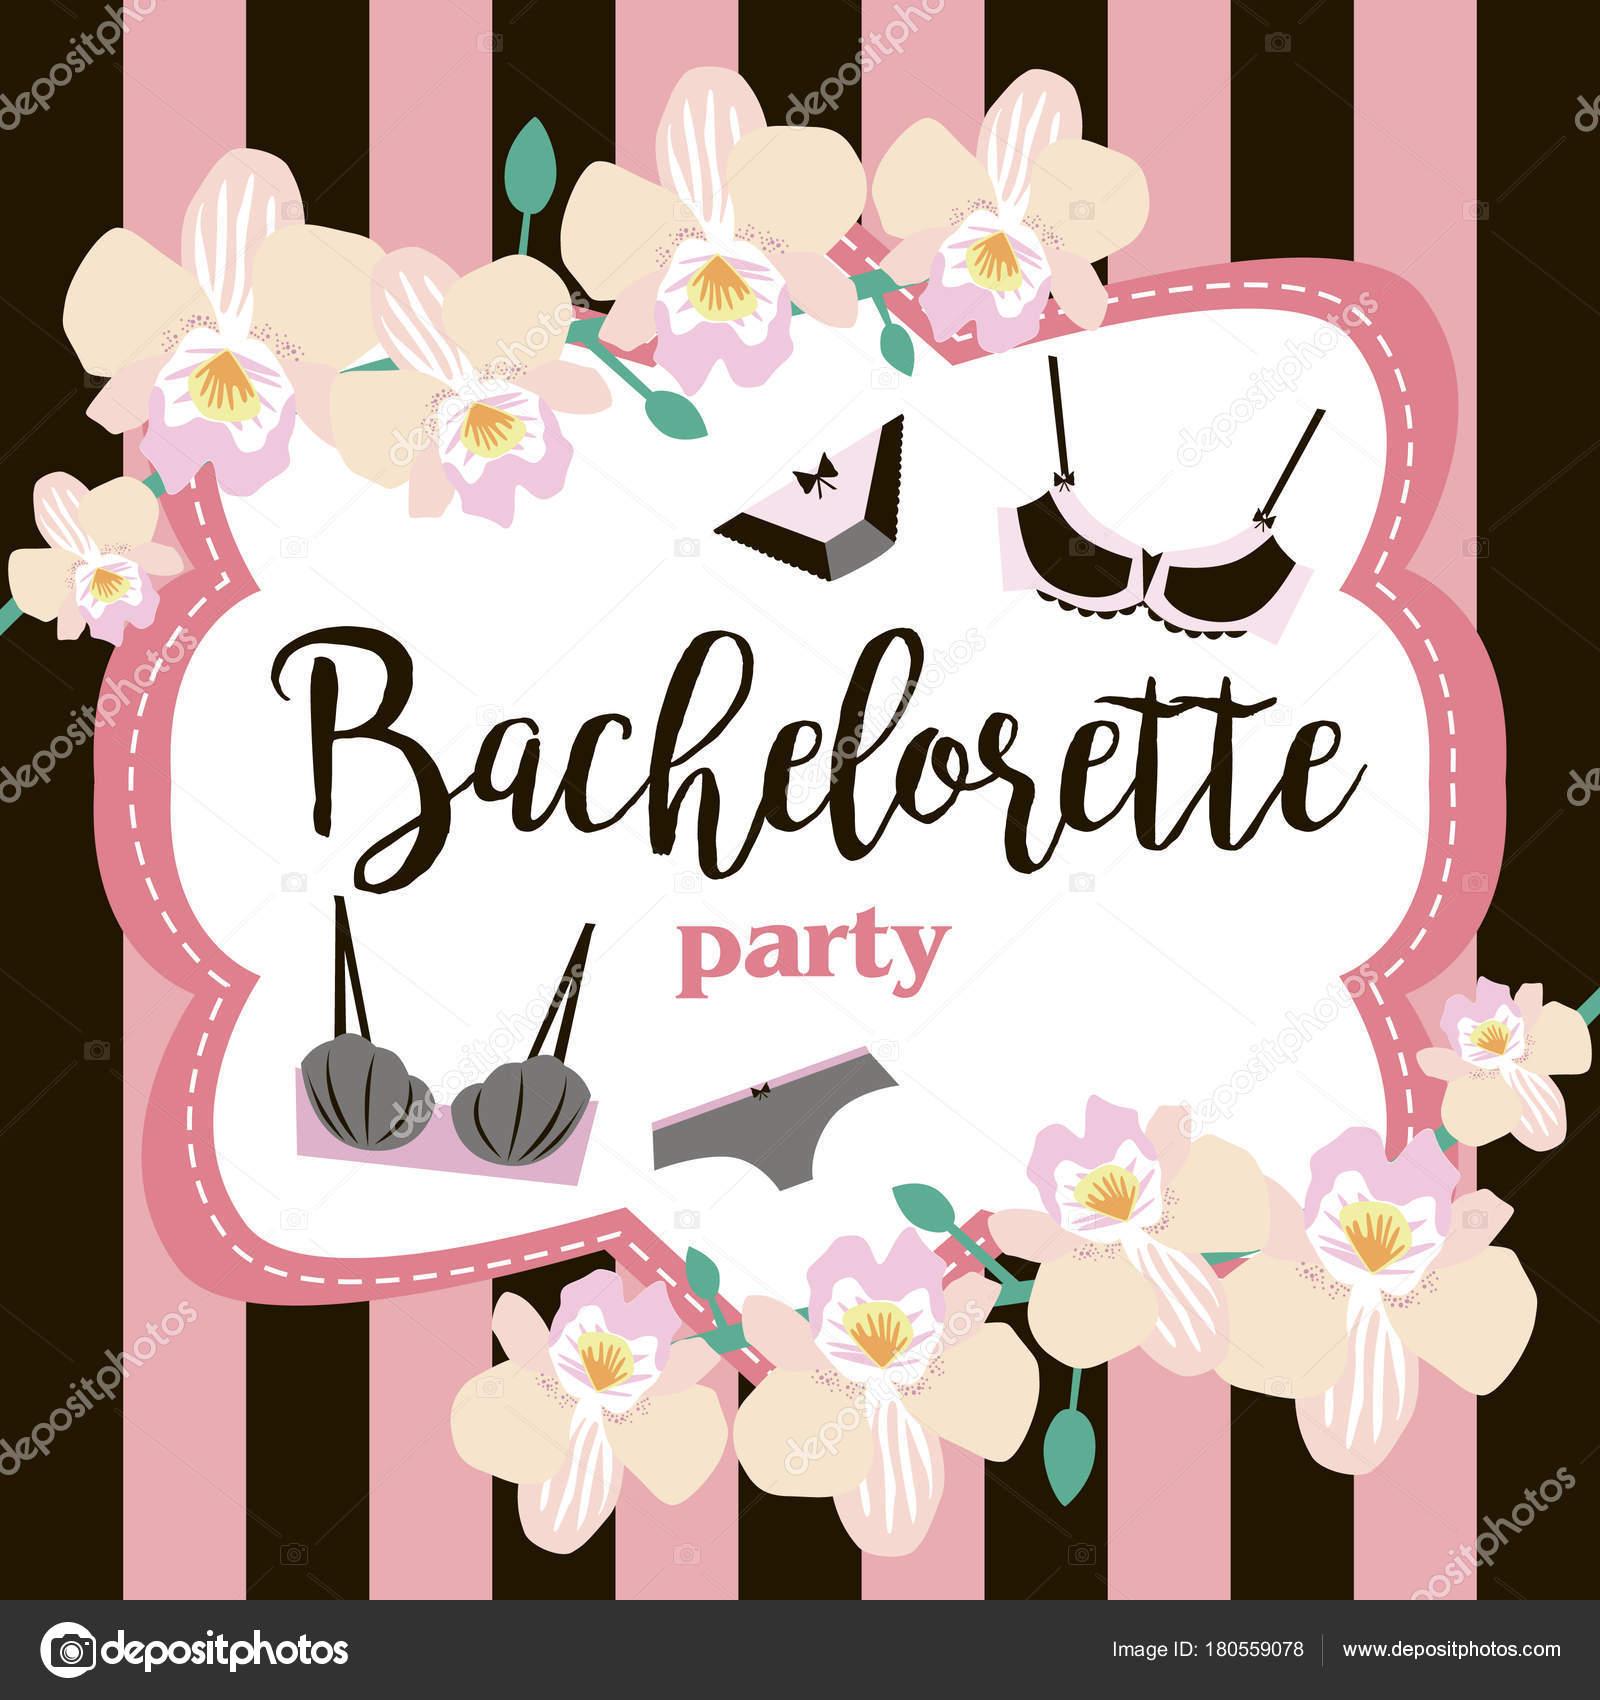 Lingerie Party Invitation Cards Beautiful Underwear Bachelorette ...